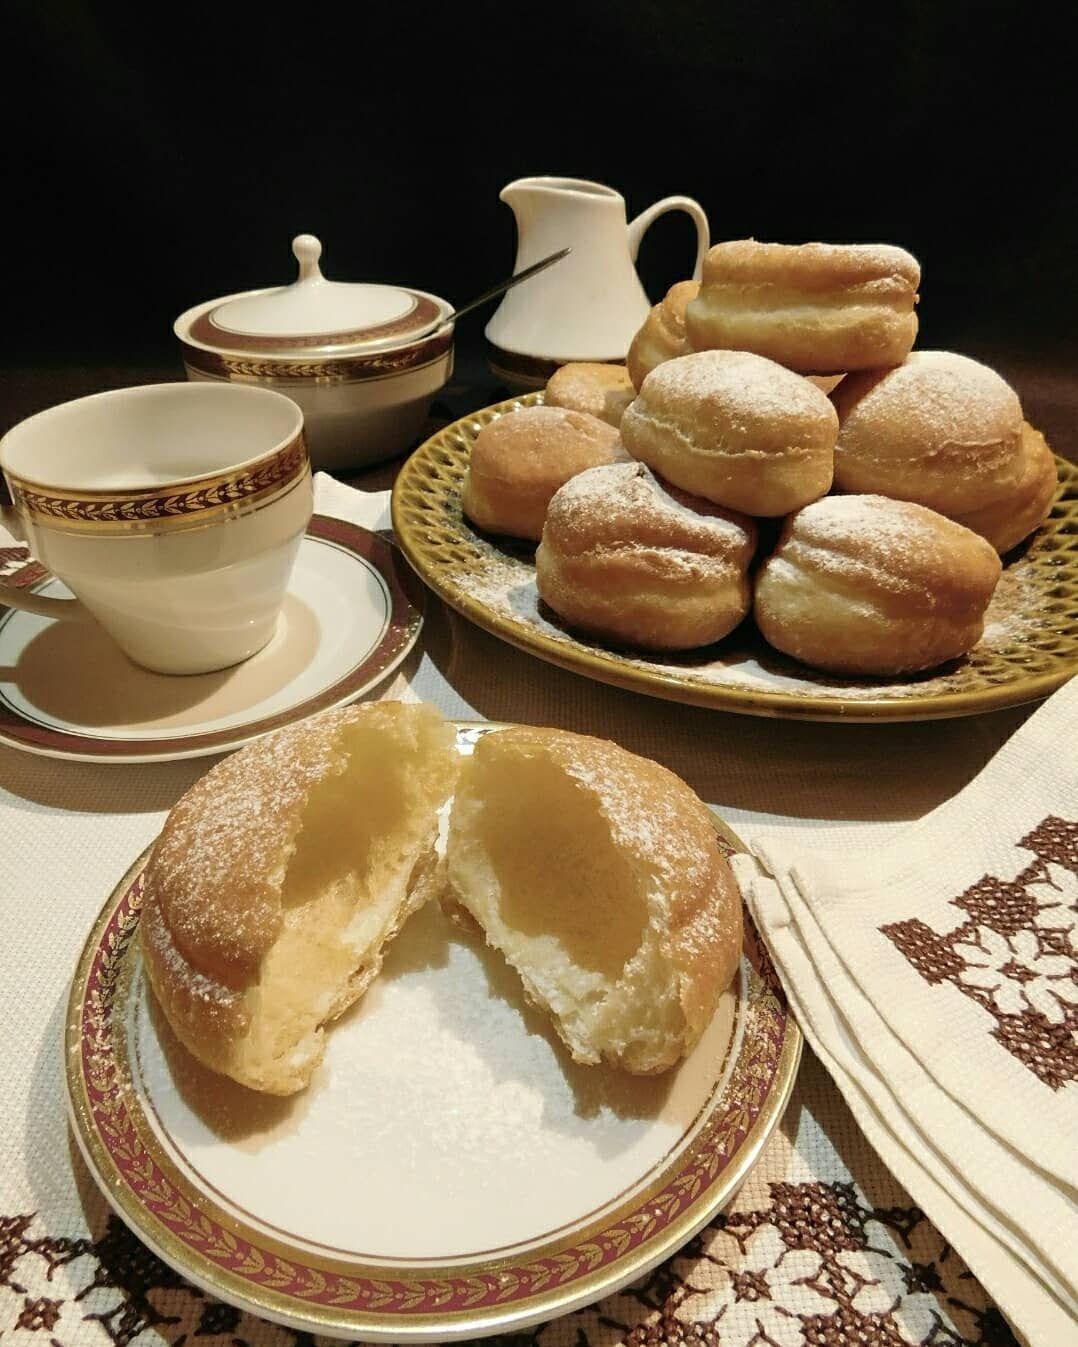 New Year By The Julian Calendar Doughnuts Oldnewyear Pastry Tradition Fried Powderedsugar Srpskanovagodina Krofne Pastry Food Newyear